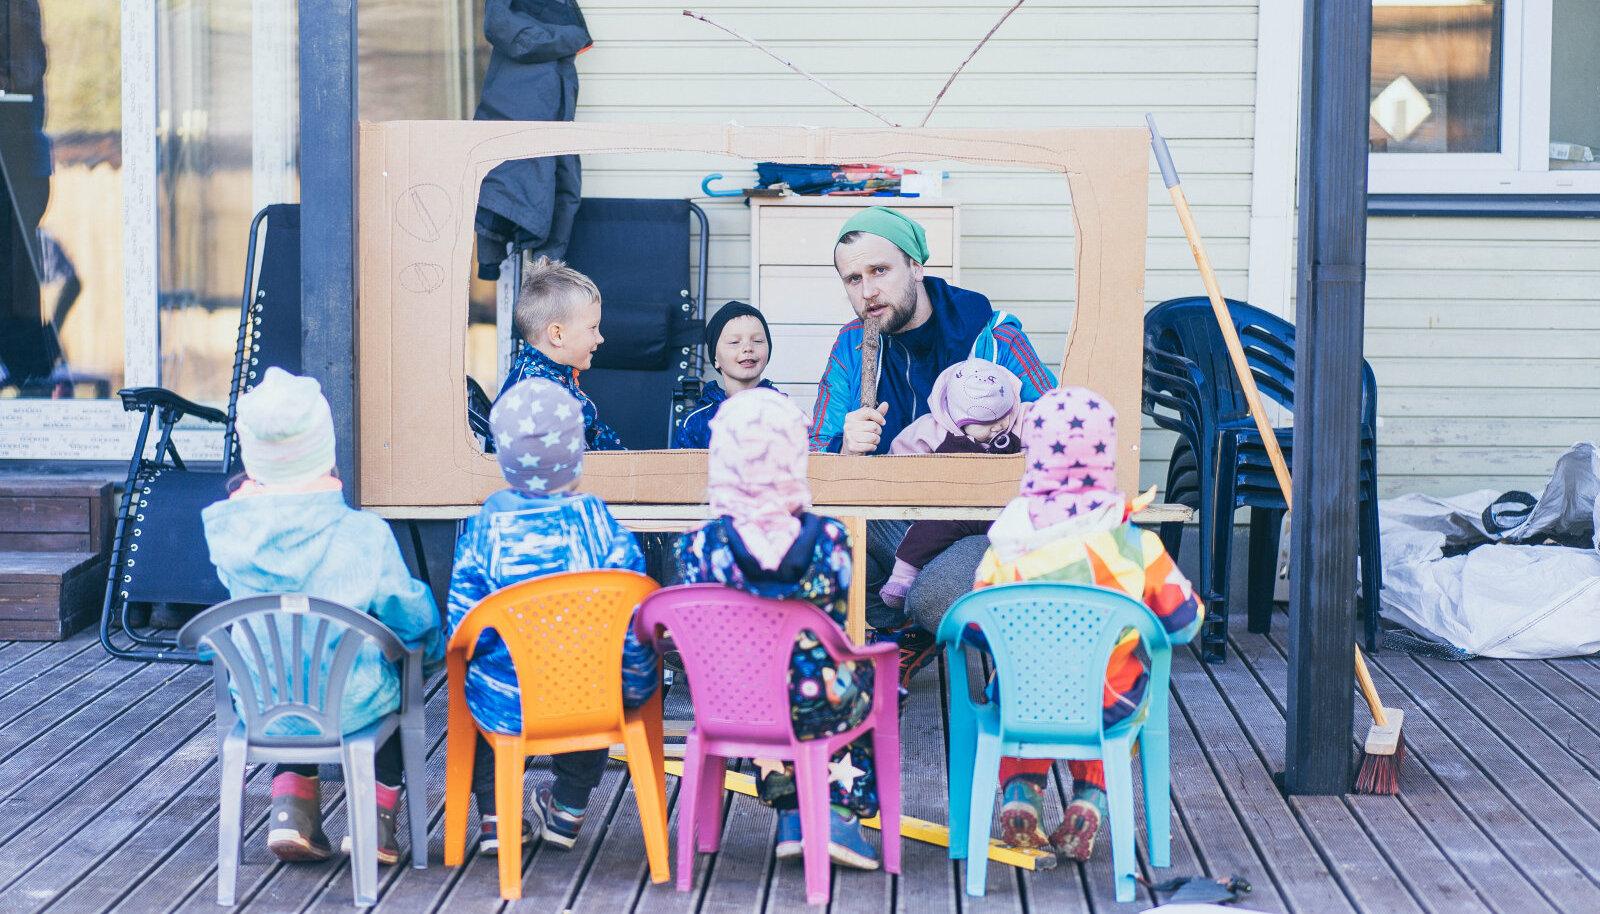 Foto: Kadri Valsberg/erakogu